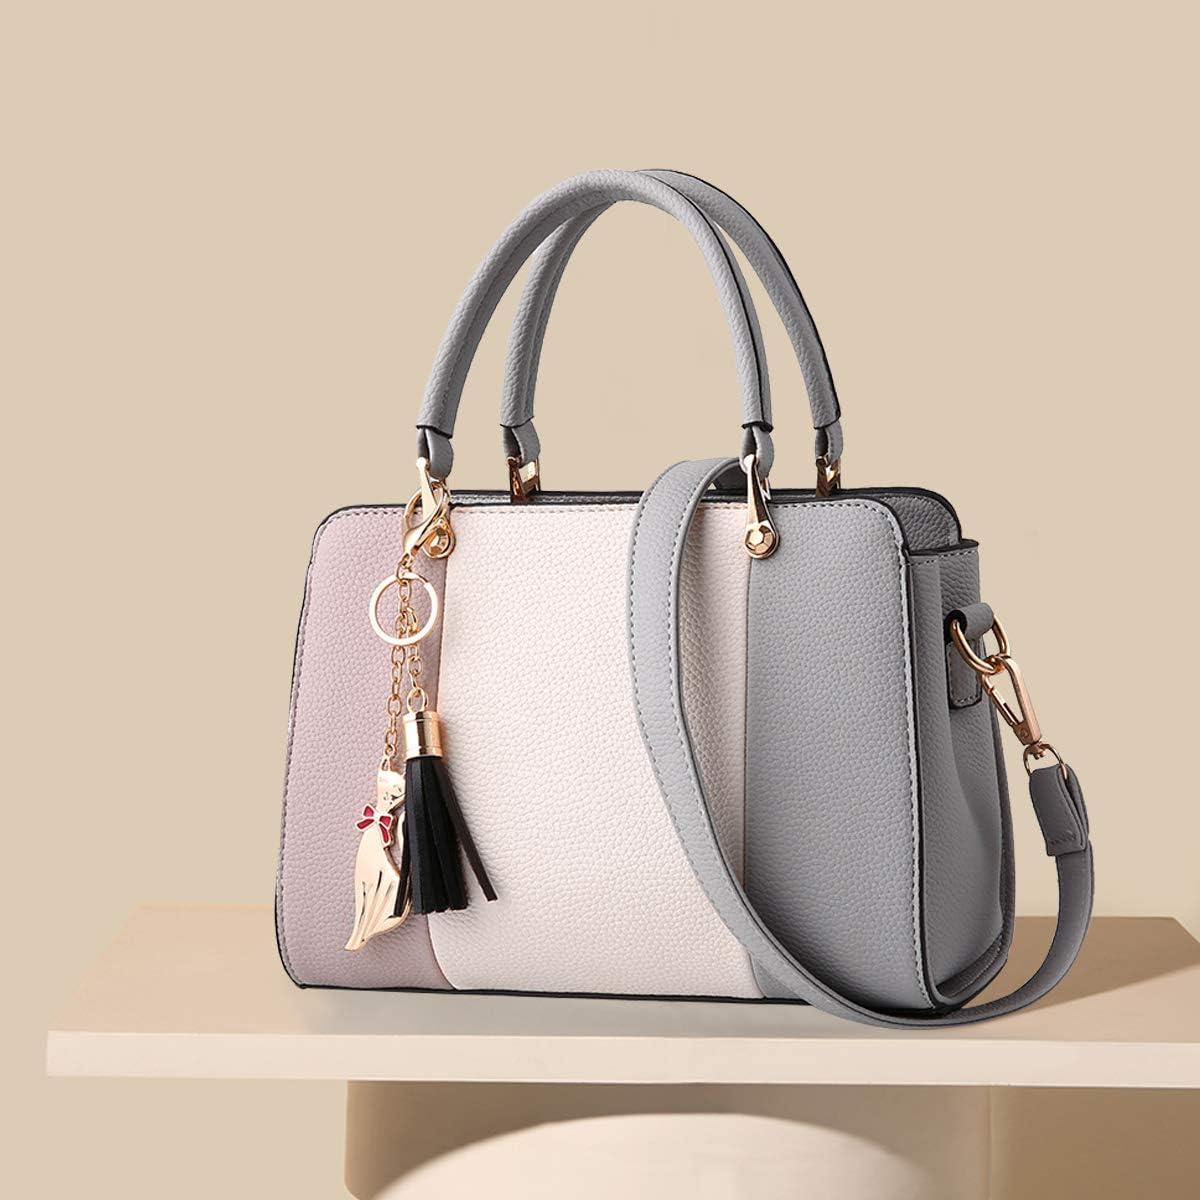 NICOLE/&DORIS Women Handbags Tassels bags Designer Top Handle Shoulder Bags Tote Crossbody Bag for Ladies PU Leather Bag With Pendant